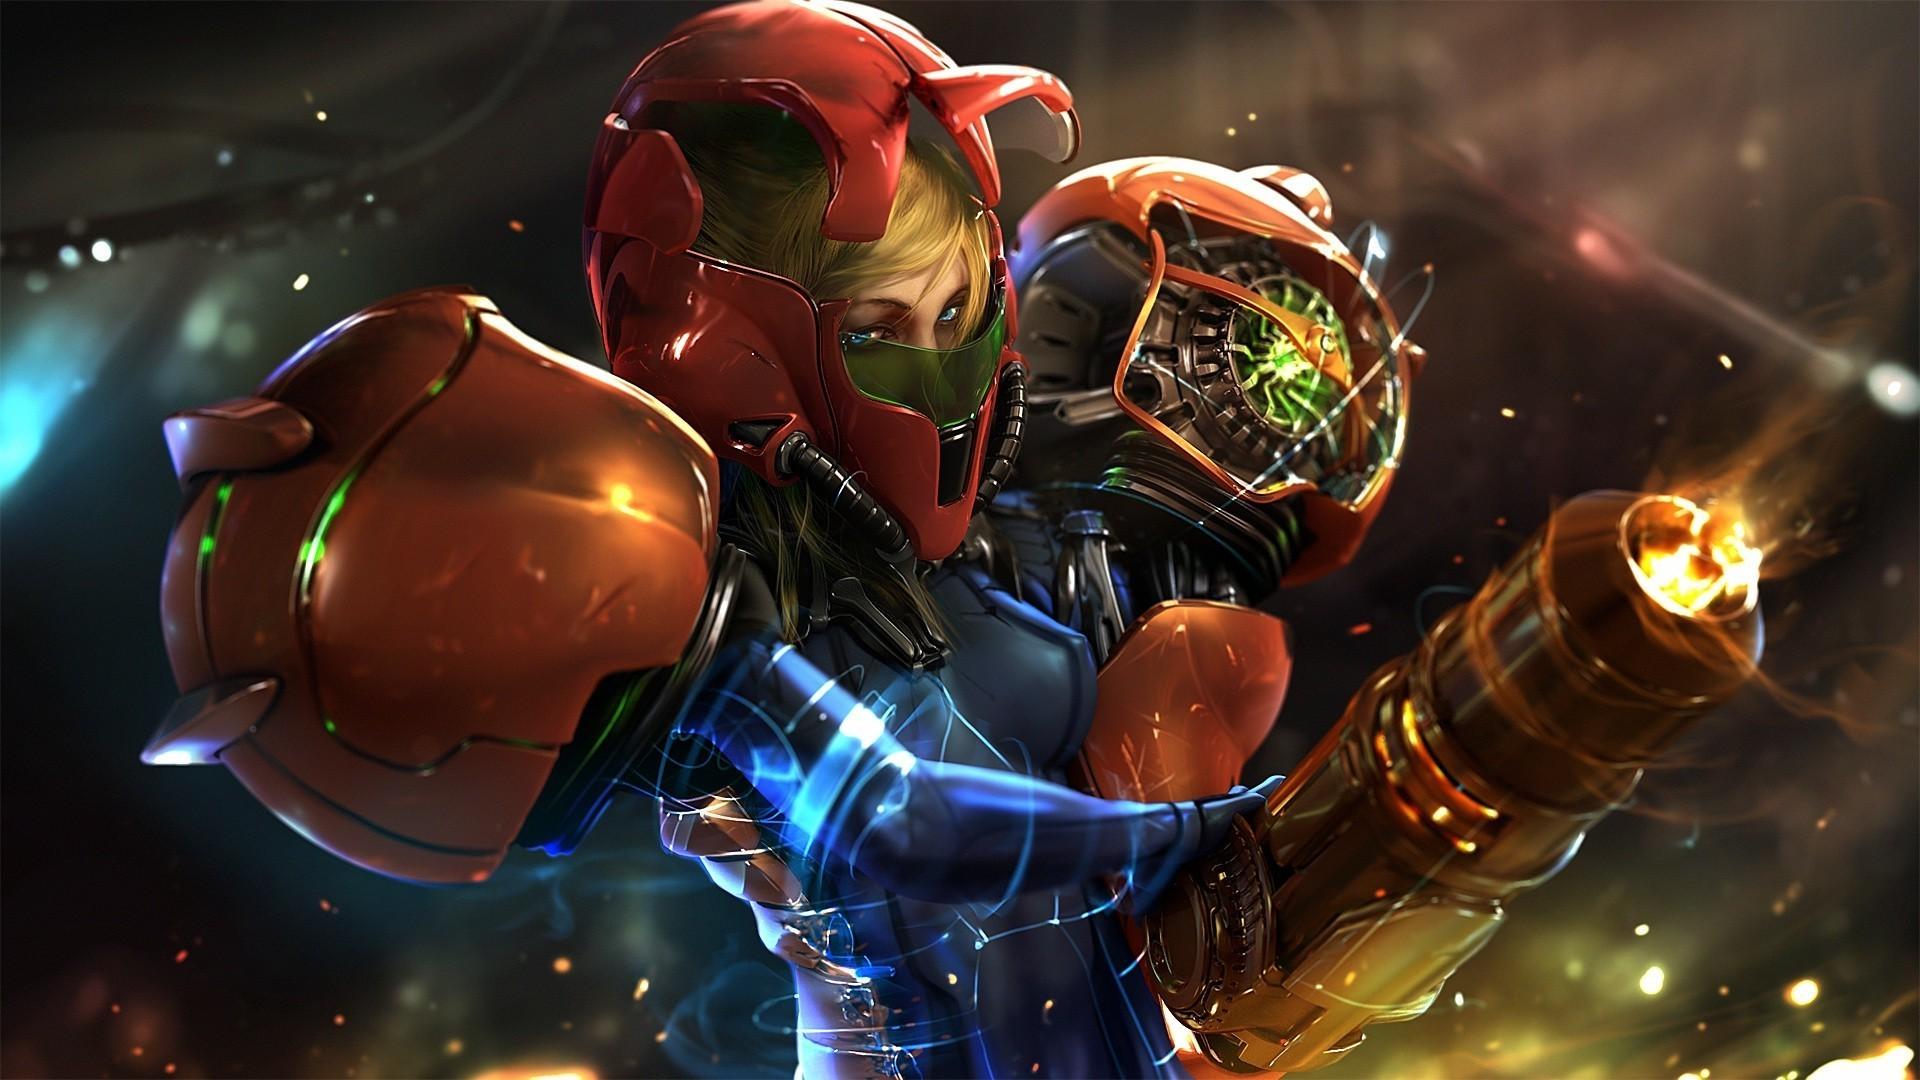 video Games, Metroid, Samus Aran Wallpapers HD / Desktop and Mobile  Backgrounds